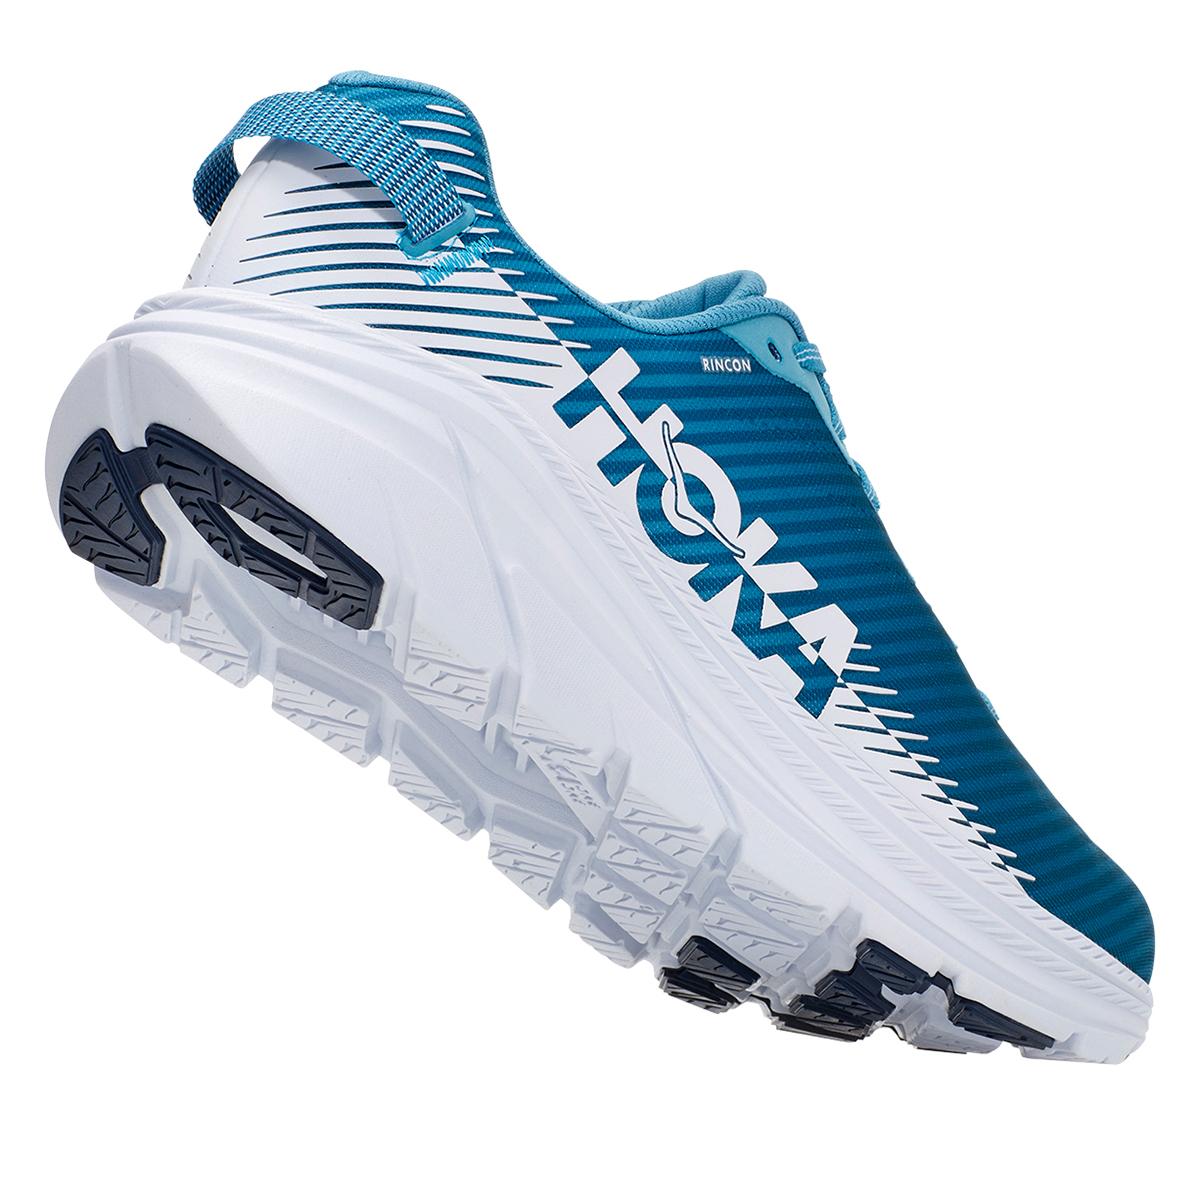 Men's Hoka One One Rincon 2 Running Shoe - Color: Blue Moon/White - Size: 7 - Width: Regular, Blue Moon/White, large, image 5